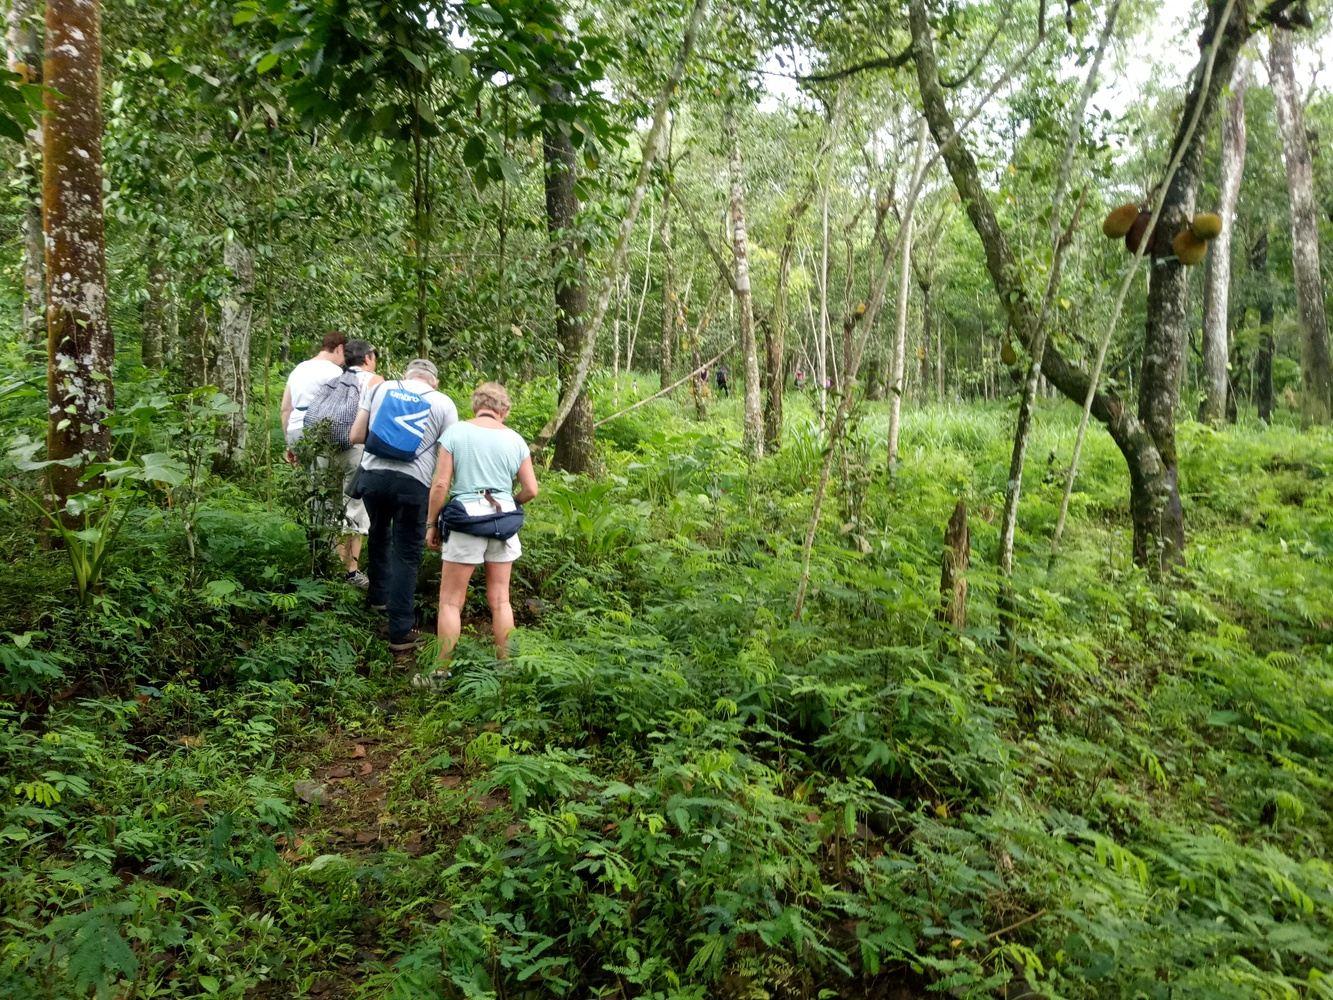 Ullen Sentalu & Merapi Trekking